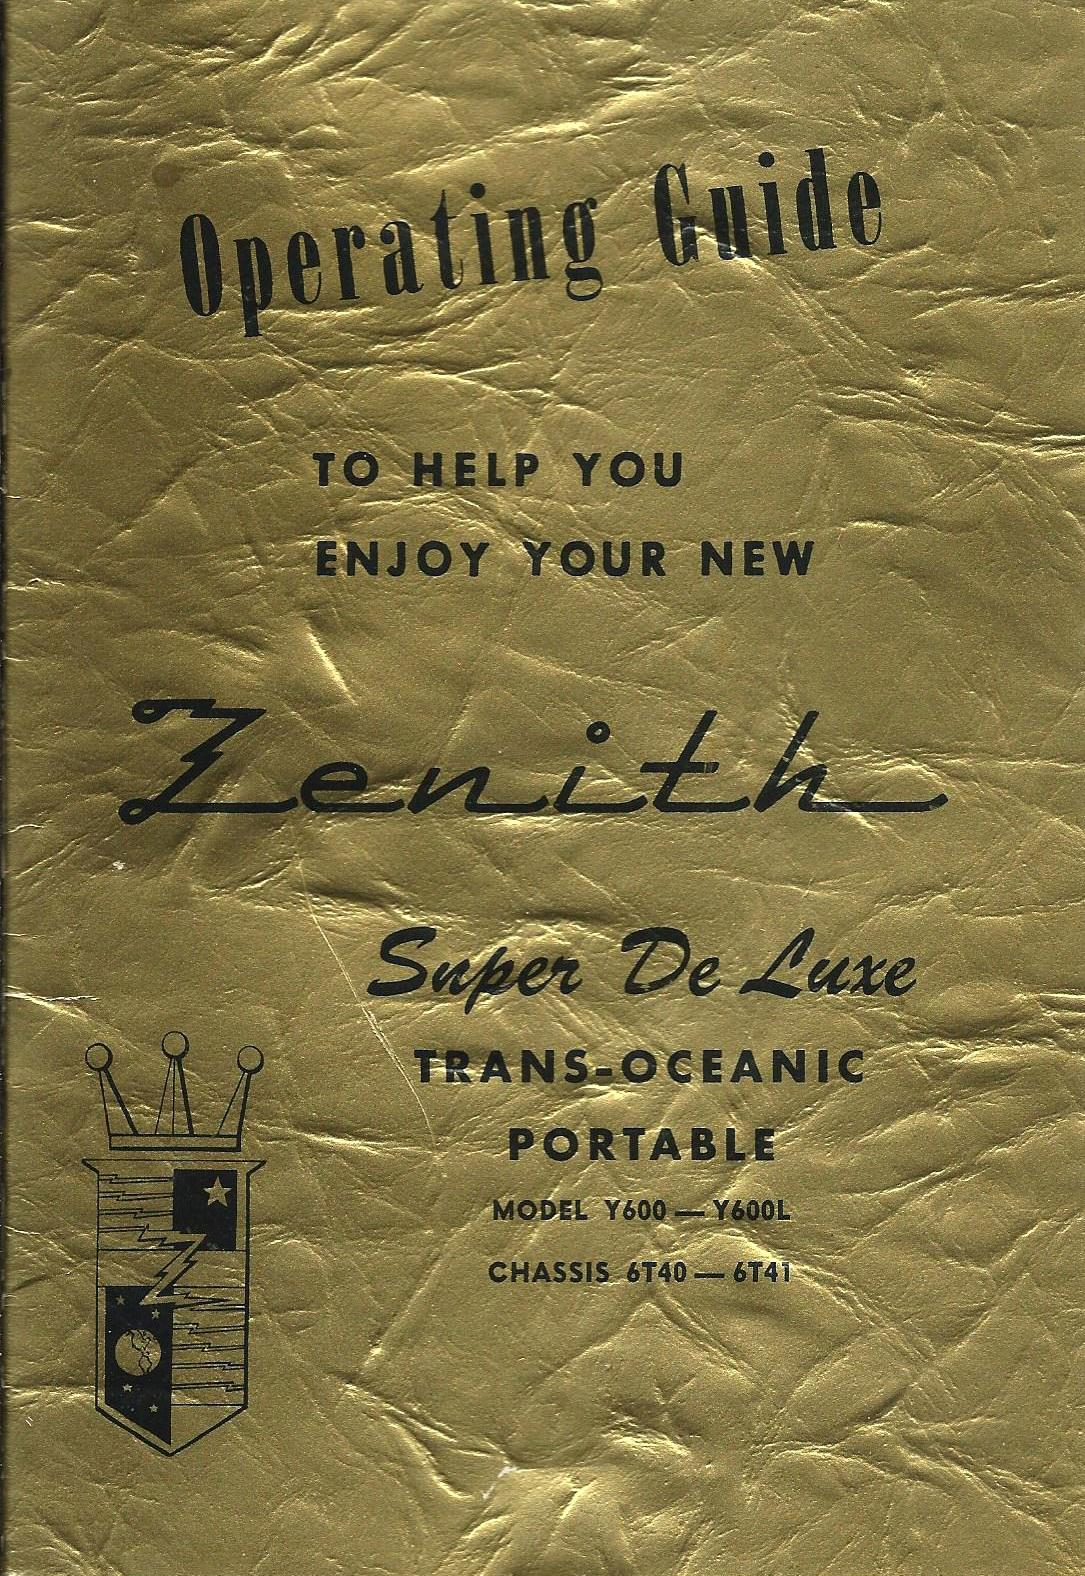 Fileinstruction Booklet For Vintage Zenith Transoceanic Multiband. Fileinstruction Booklet For Vintage Zenith Transoceanic Multiband Tube Radio. Wiring. Zenith Tube Radio Schematics Model 6s At Scoala.co